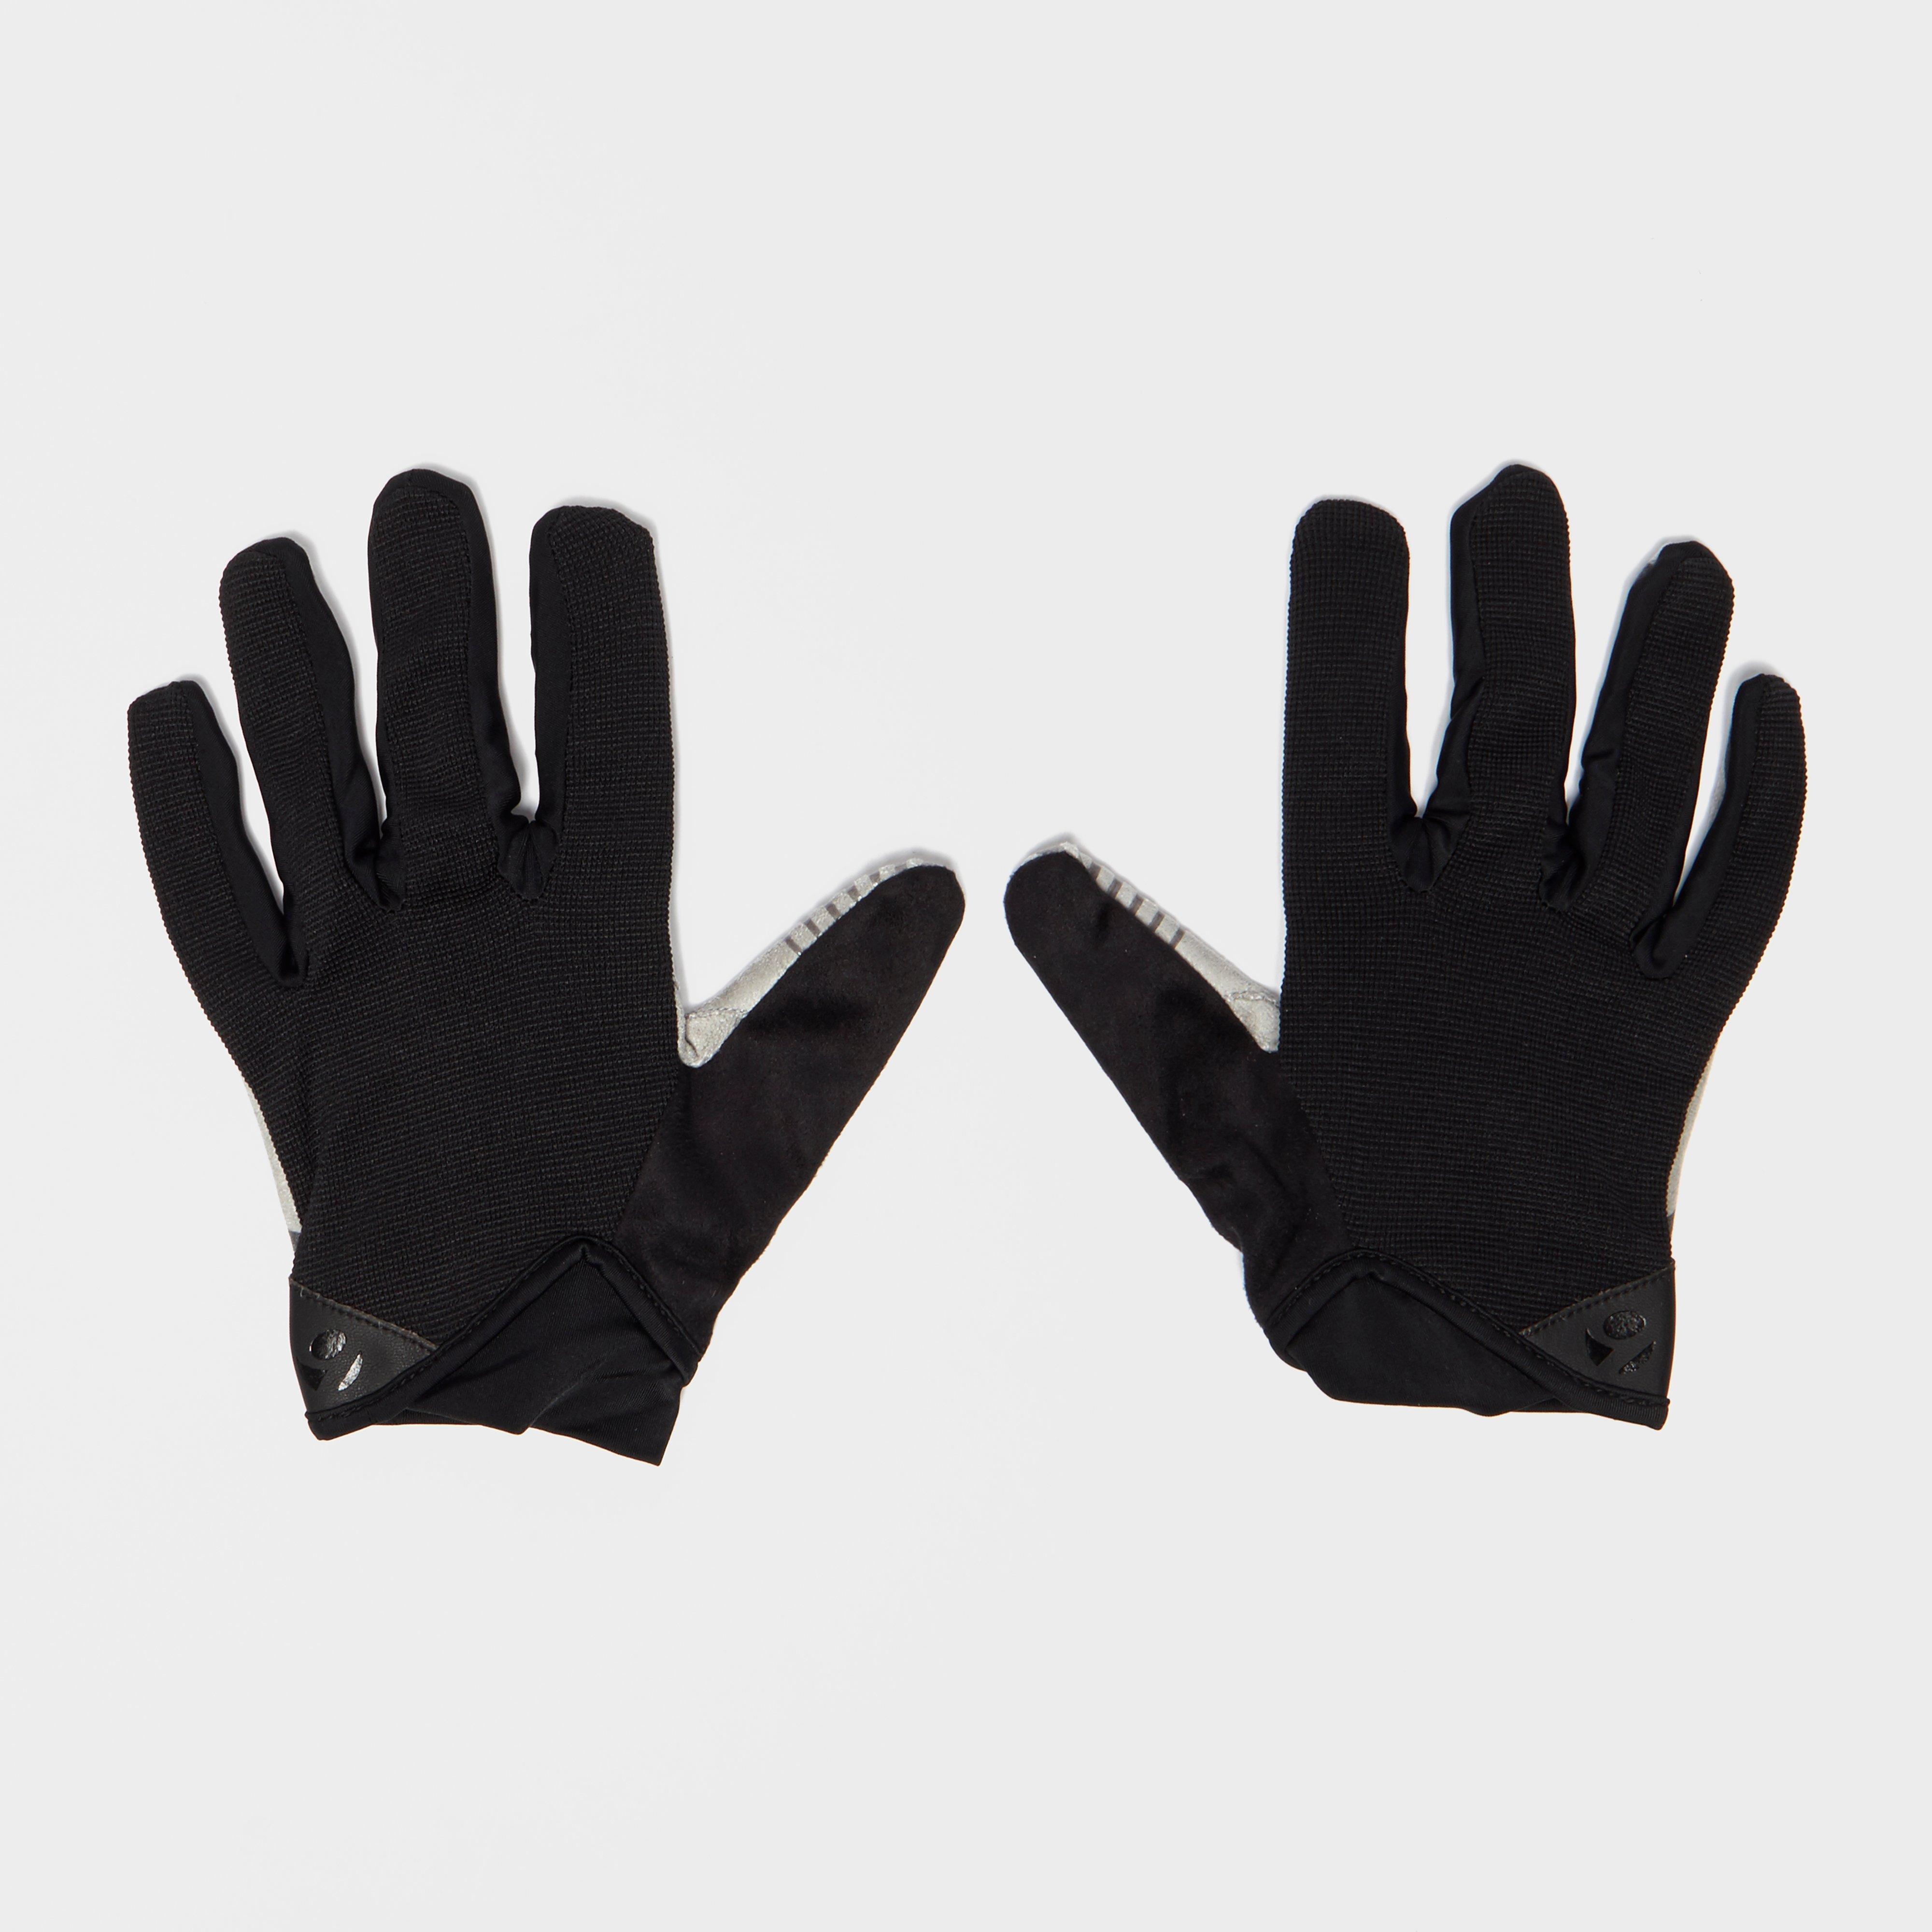 Bontrager Rhythm MTB Gloves - Black, Black